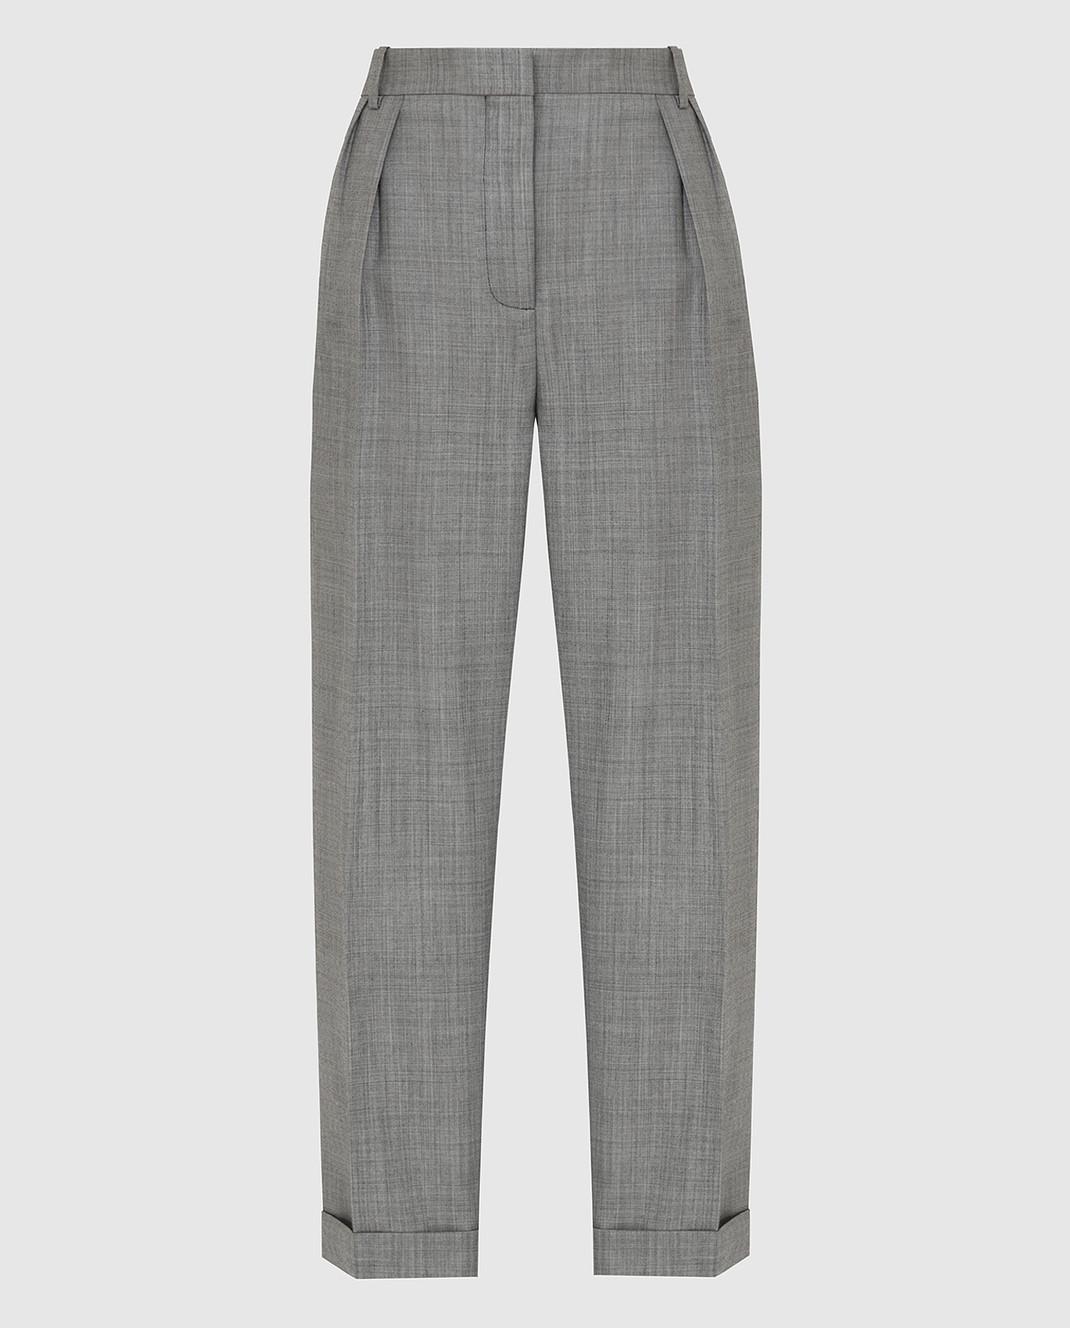 Victoria Beckham Серые брюки из шерсти TRTPR2600B